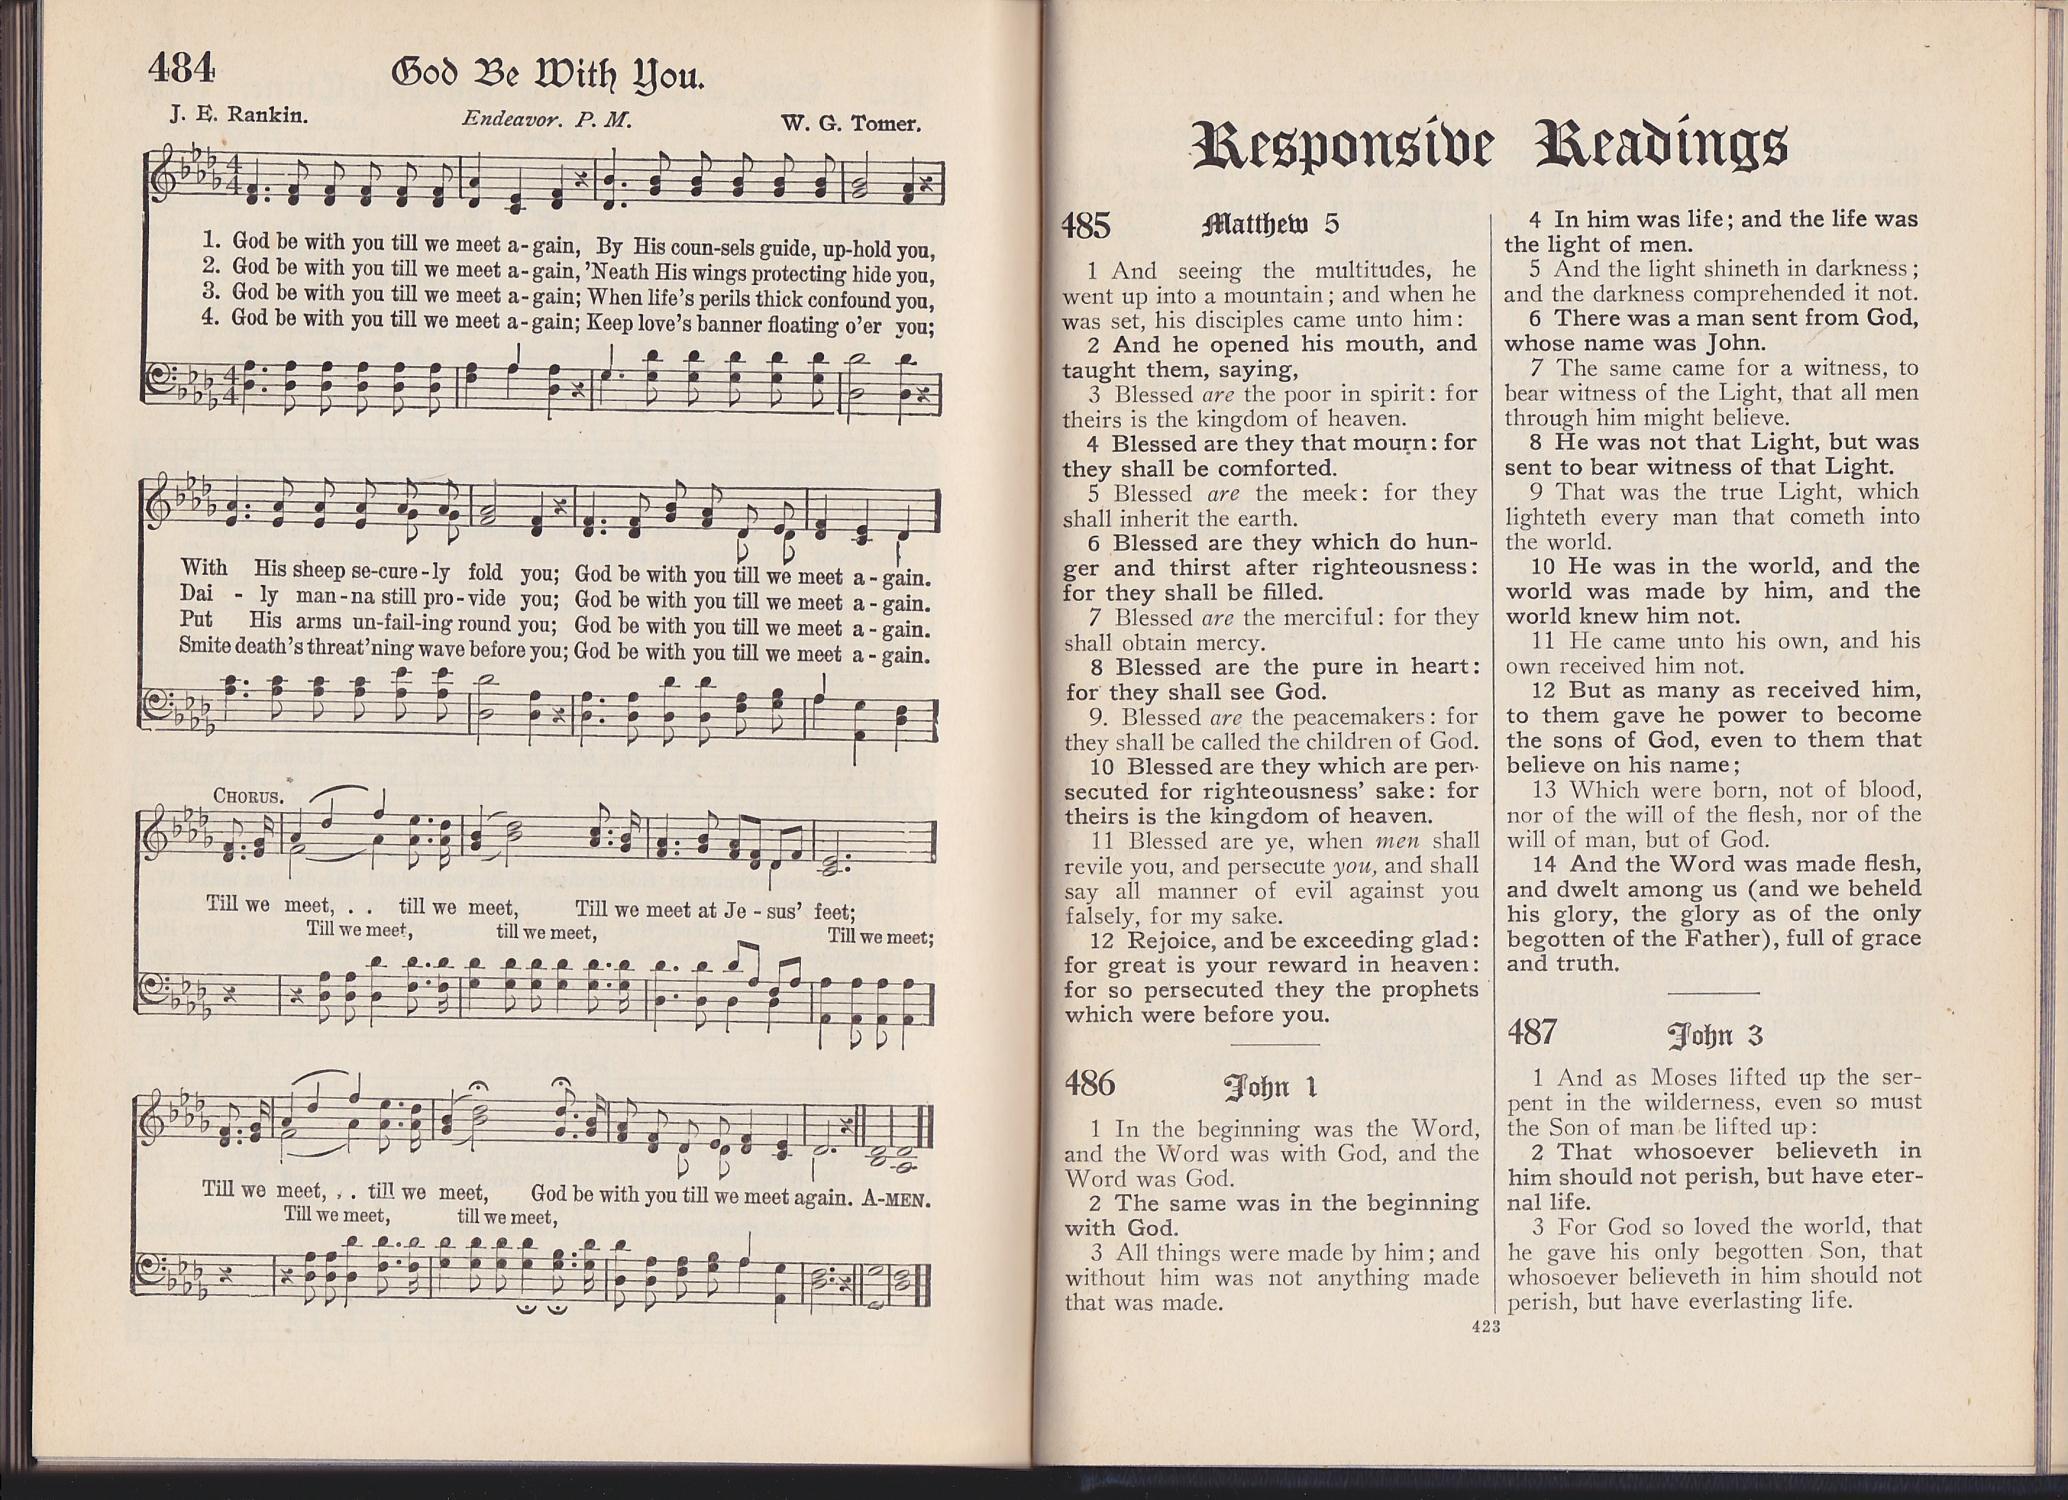 the Modern Hymnal, Standard Hymns and Gospel